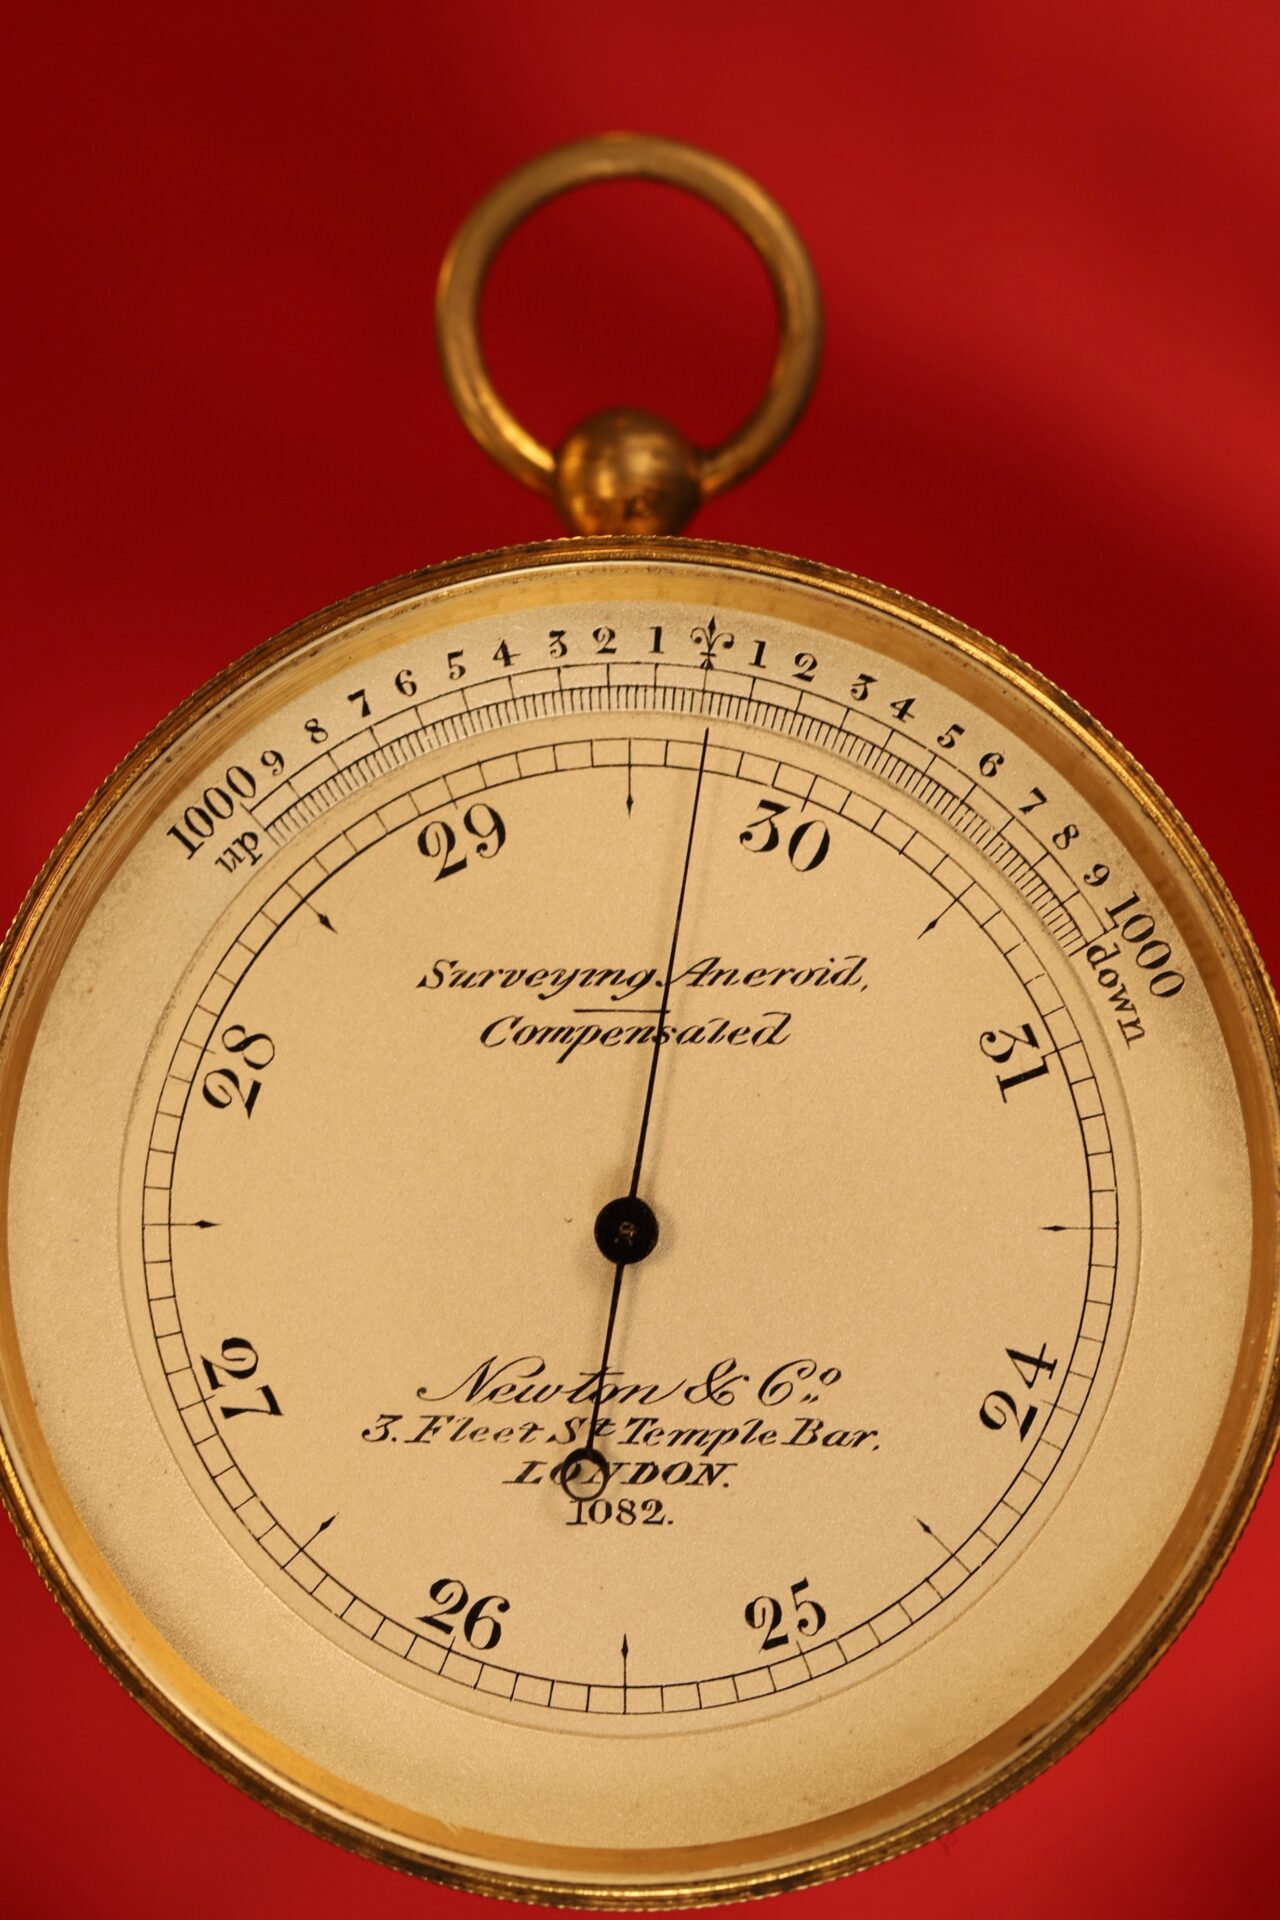 Image of front of Newton Pocket Barometer No 1082